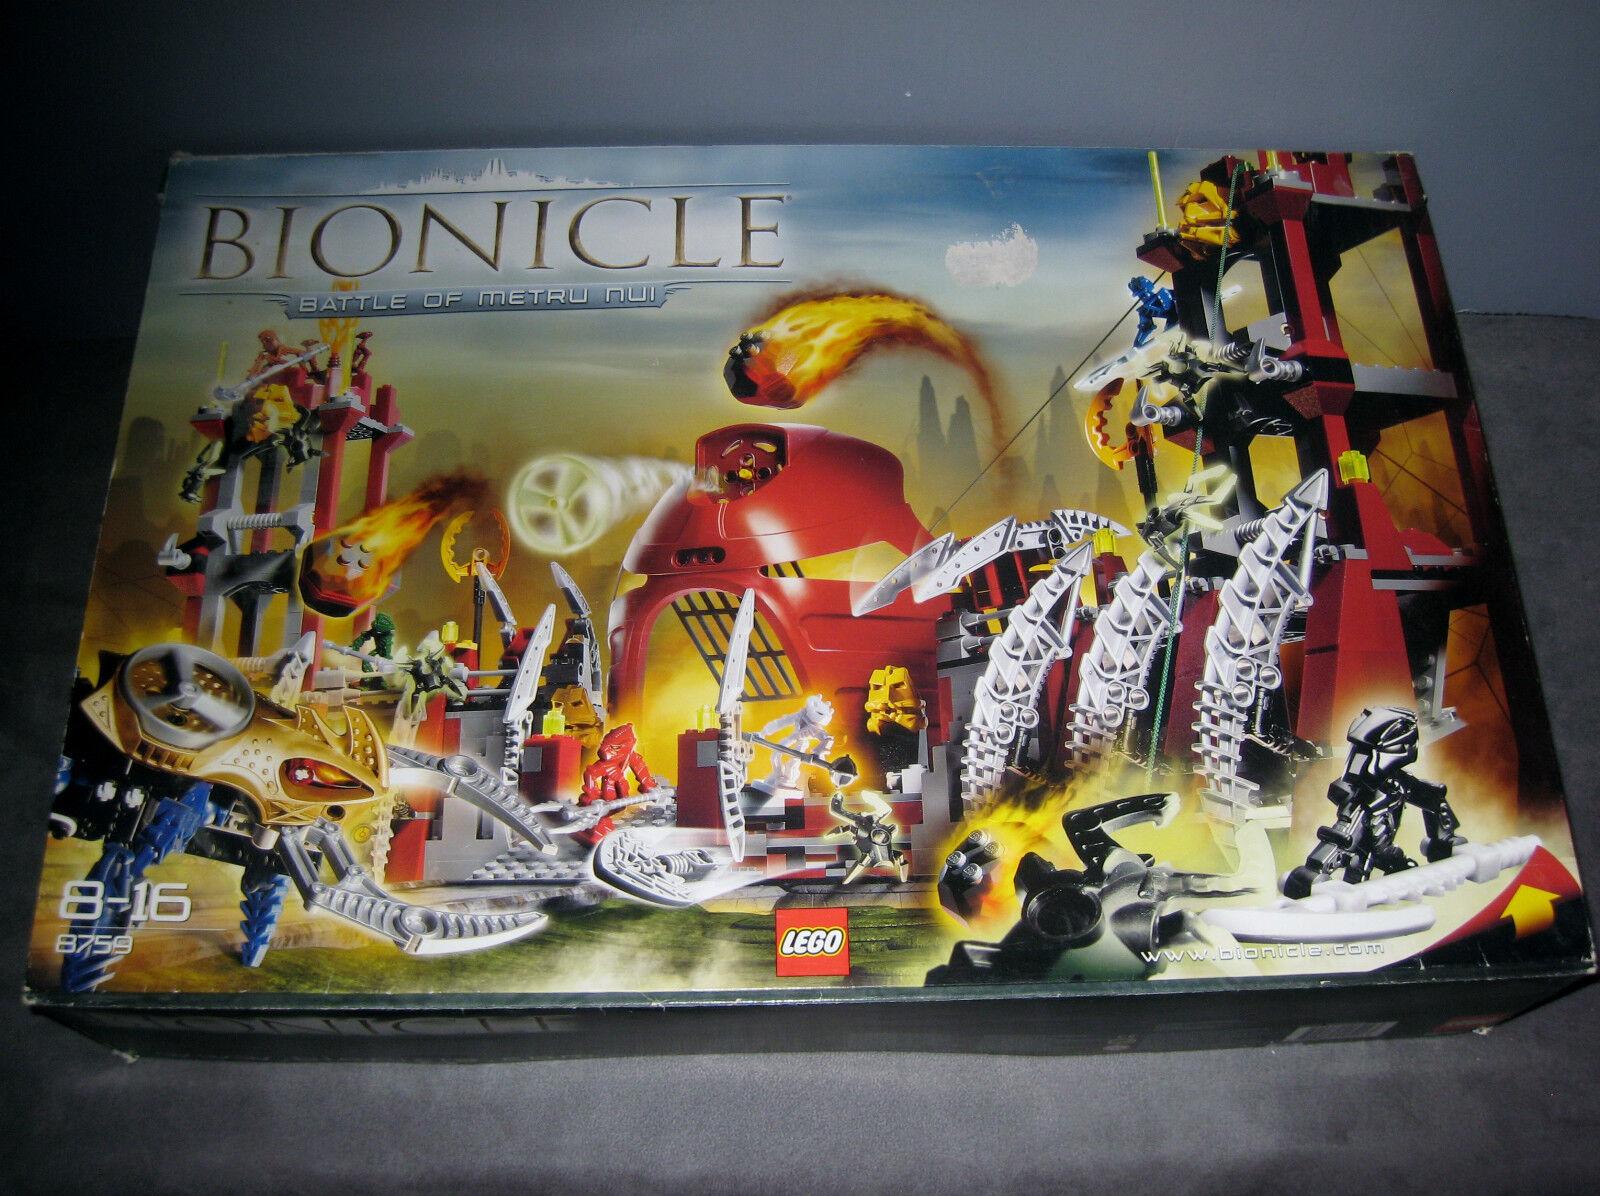 Lego 8759 Bionicle Battle of Metru Nui complet